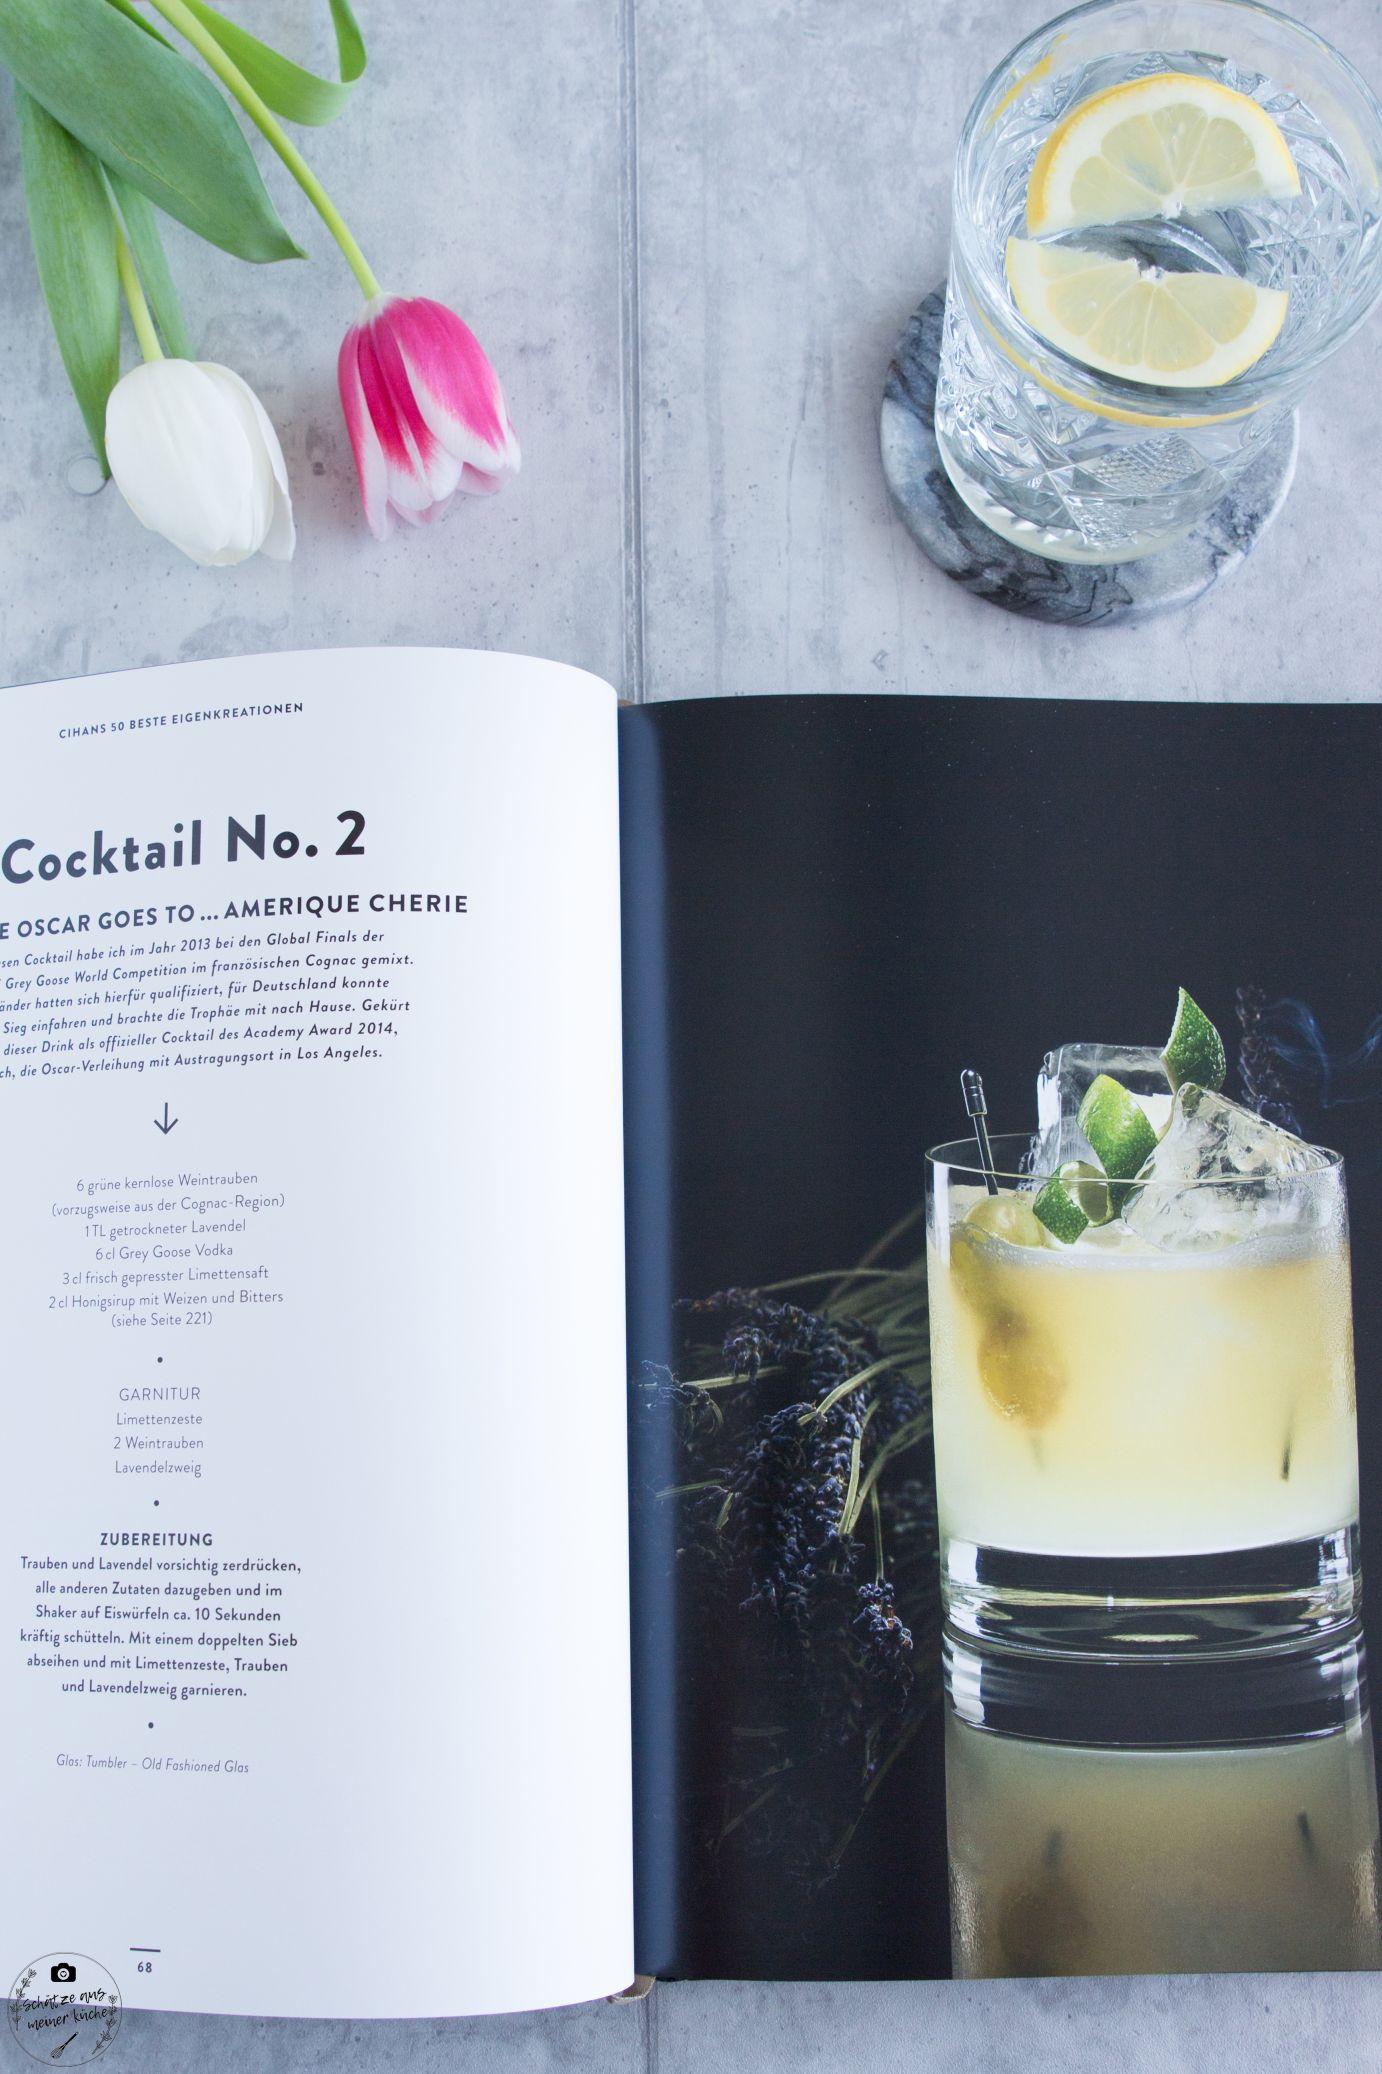 Großzügig Cocktail Bar Nach Hause Ideen - Images for inspirierende ...